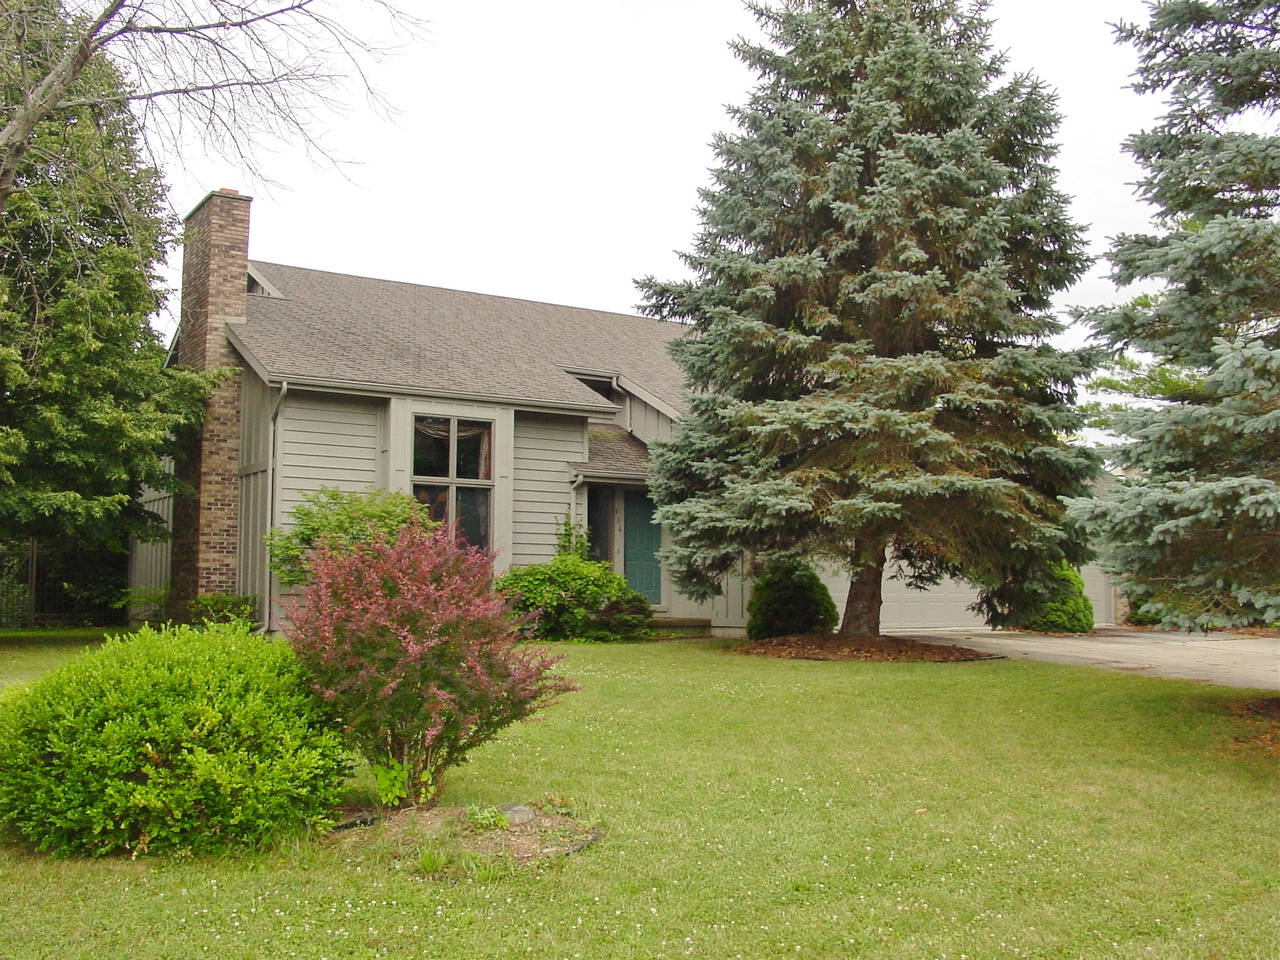 134 Deerfield Circle, Bryan, Ohio 43506